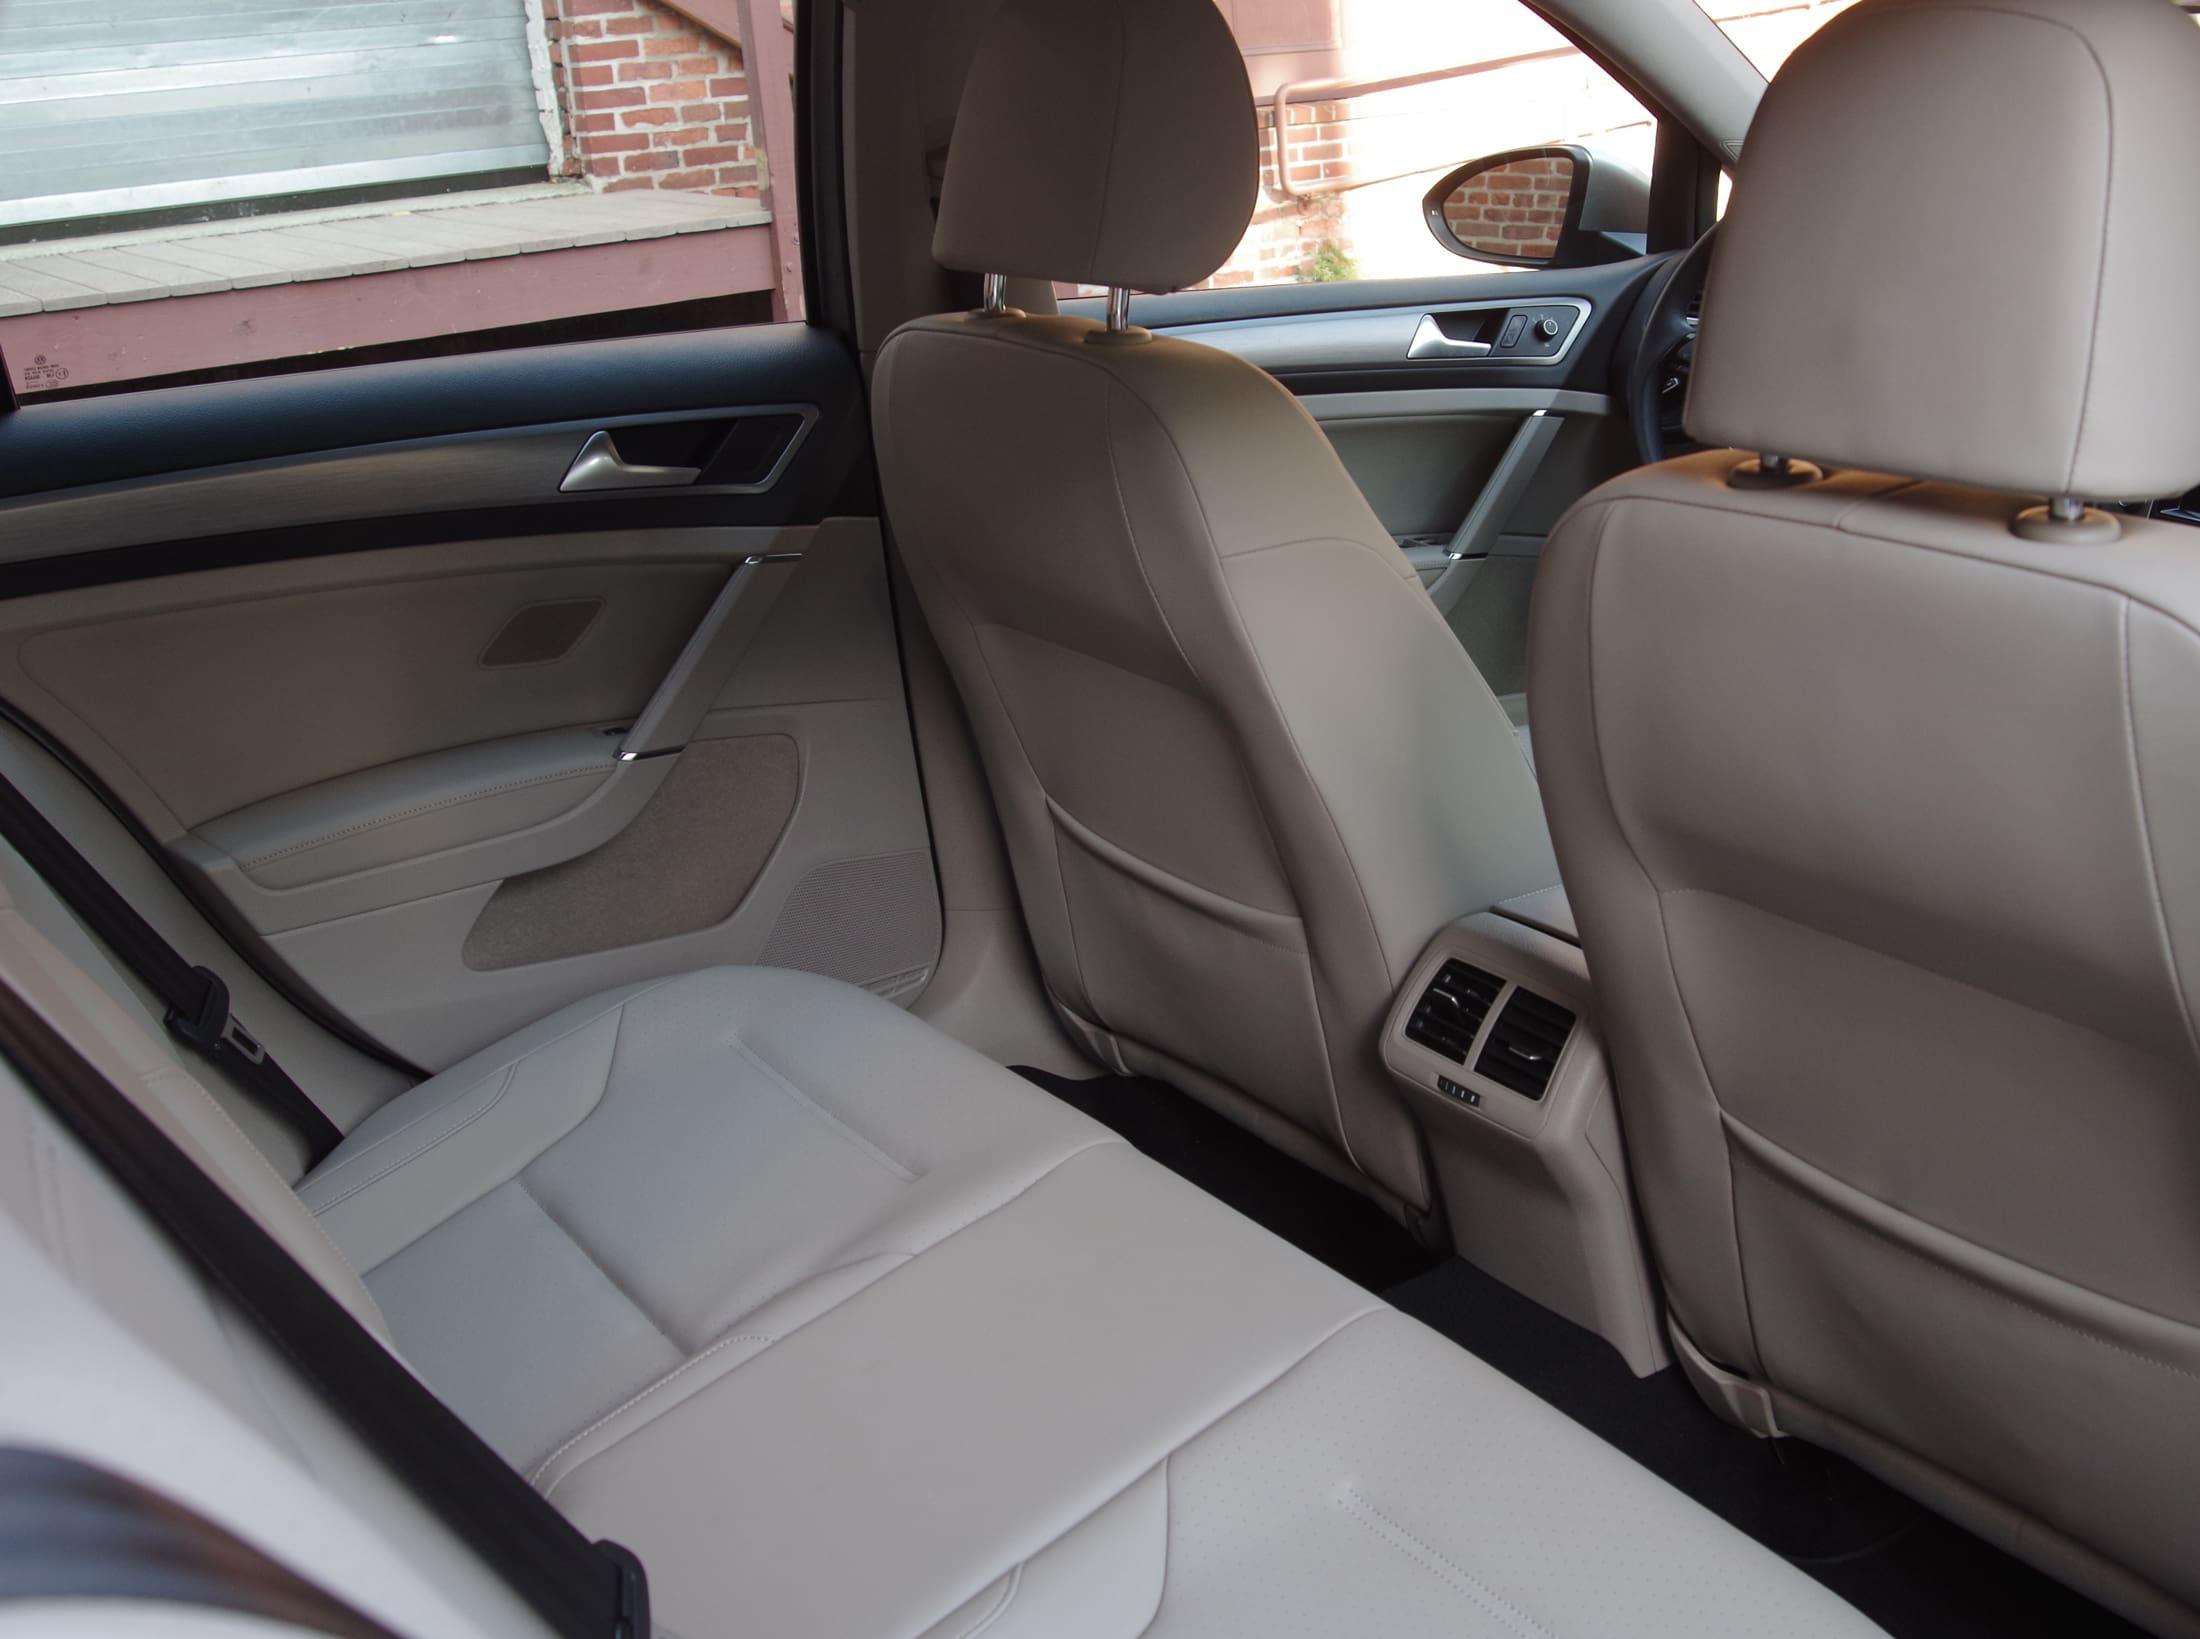 2015 VW Golf back seat